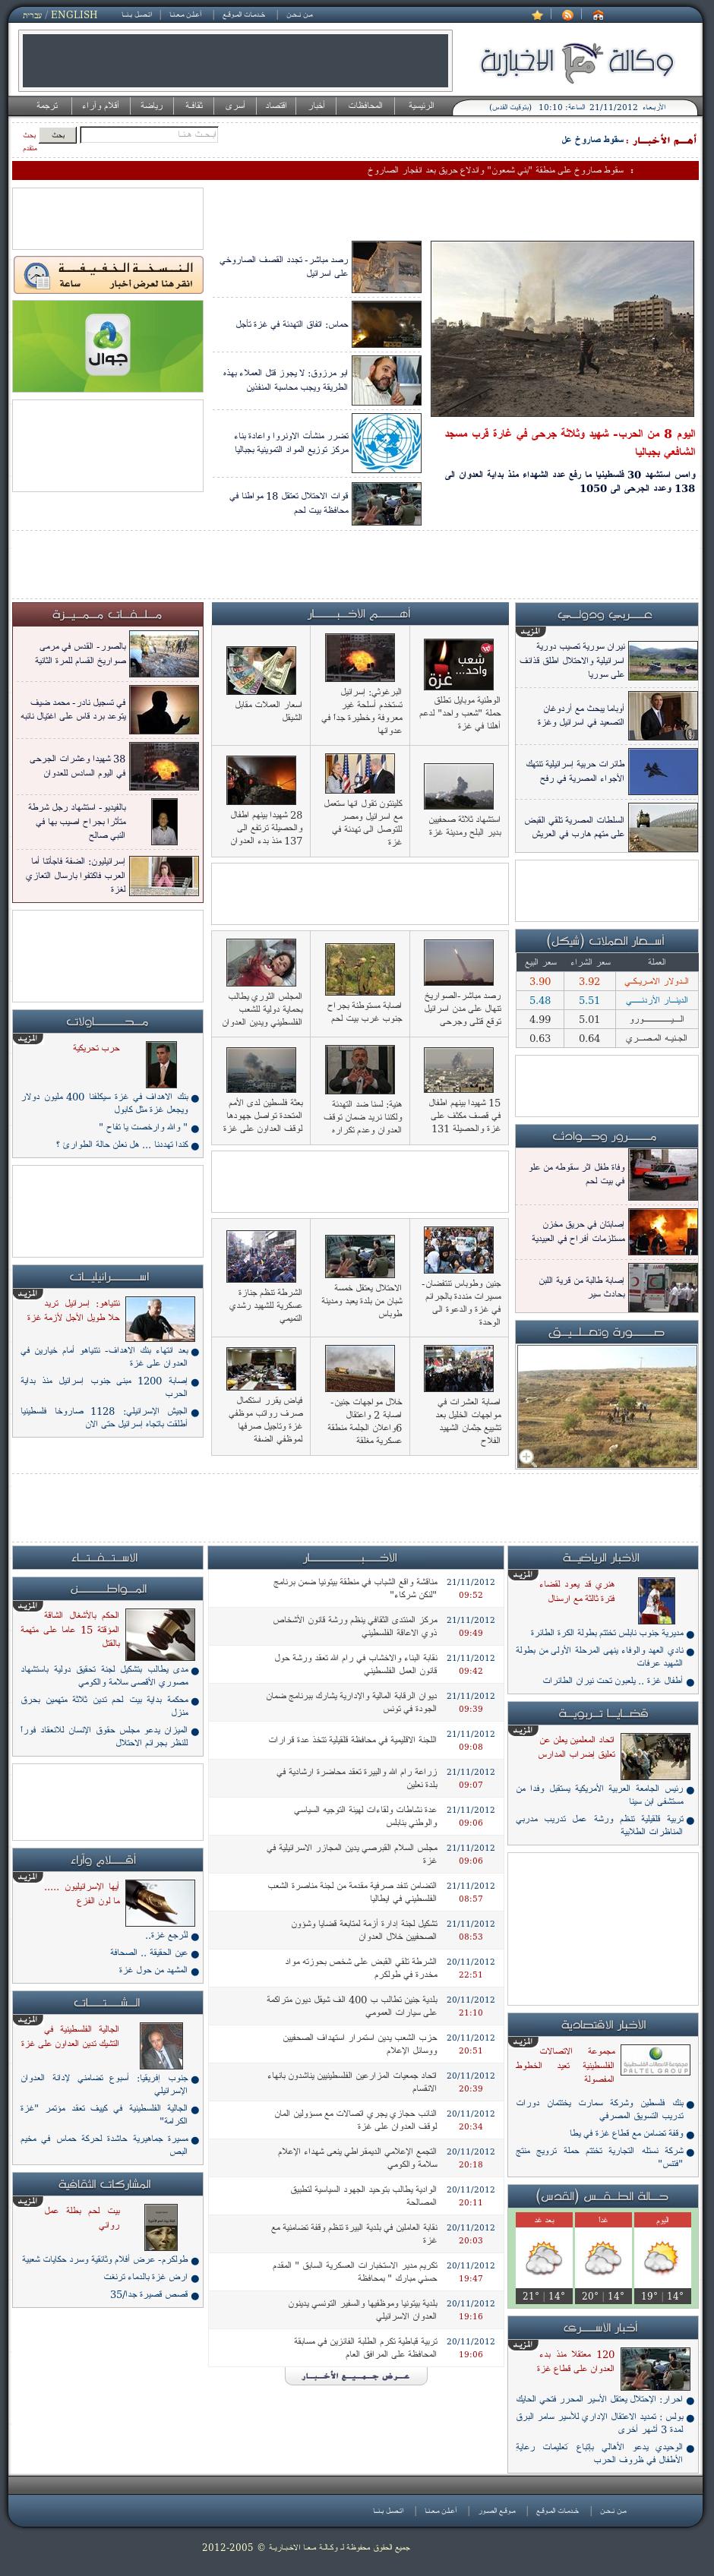 Ma'an News at Wednesday Nov. 21, 2012, 8:16 a.m. UTC